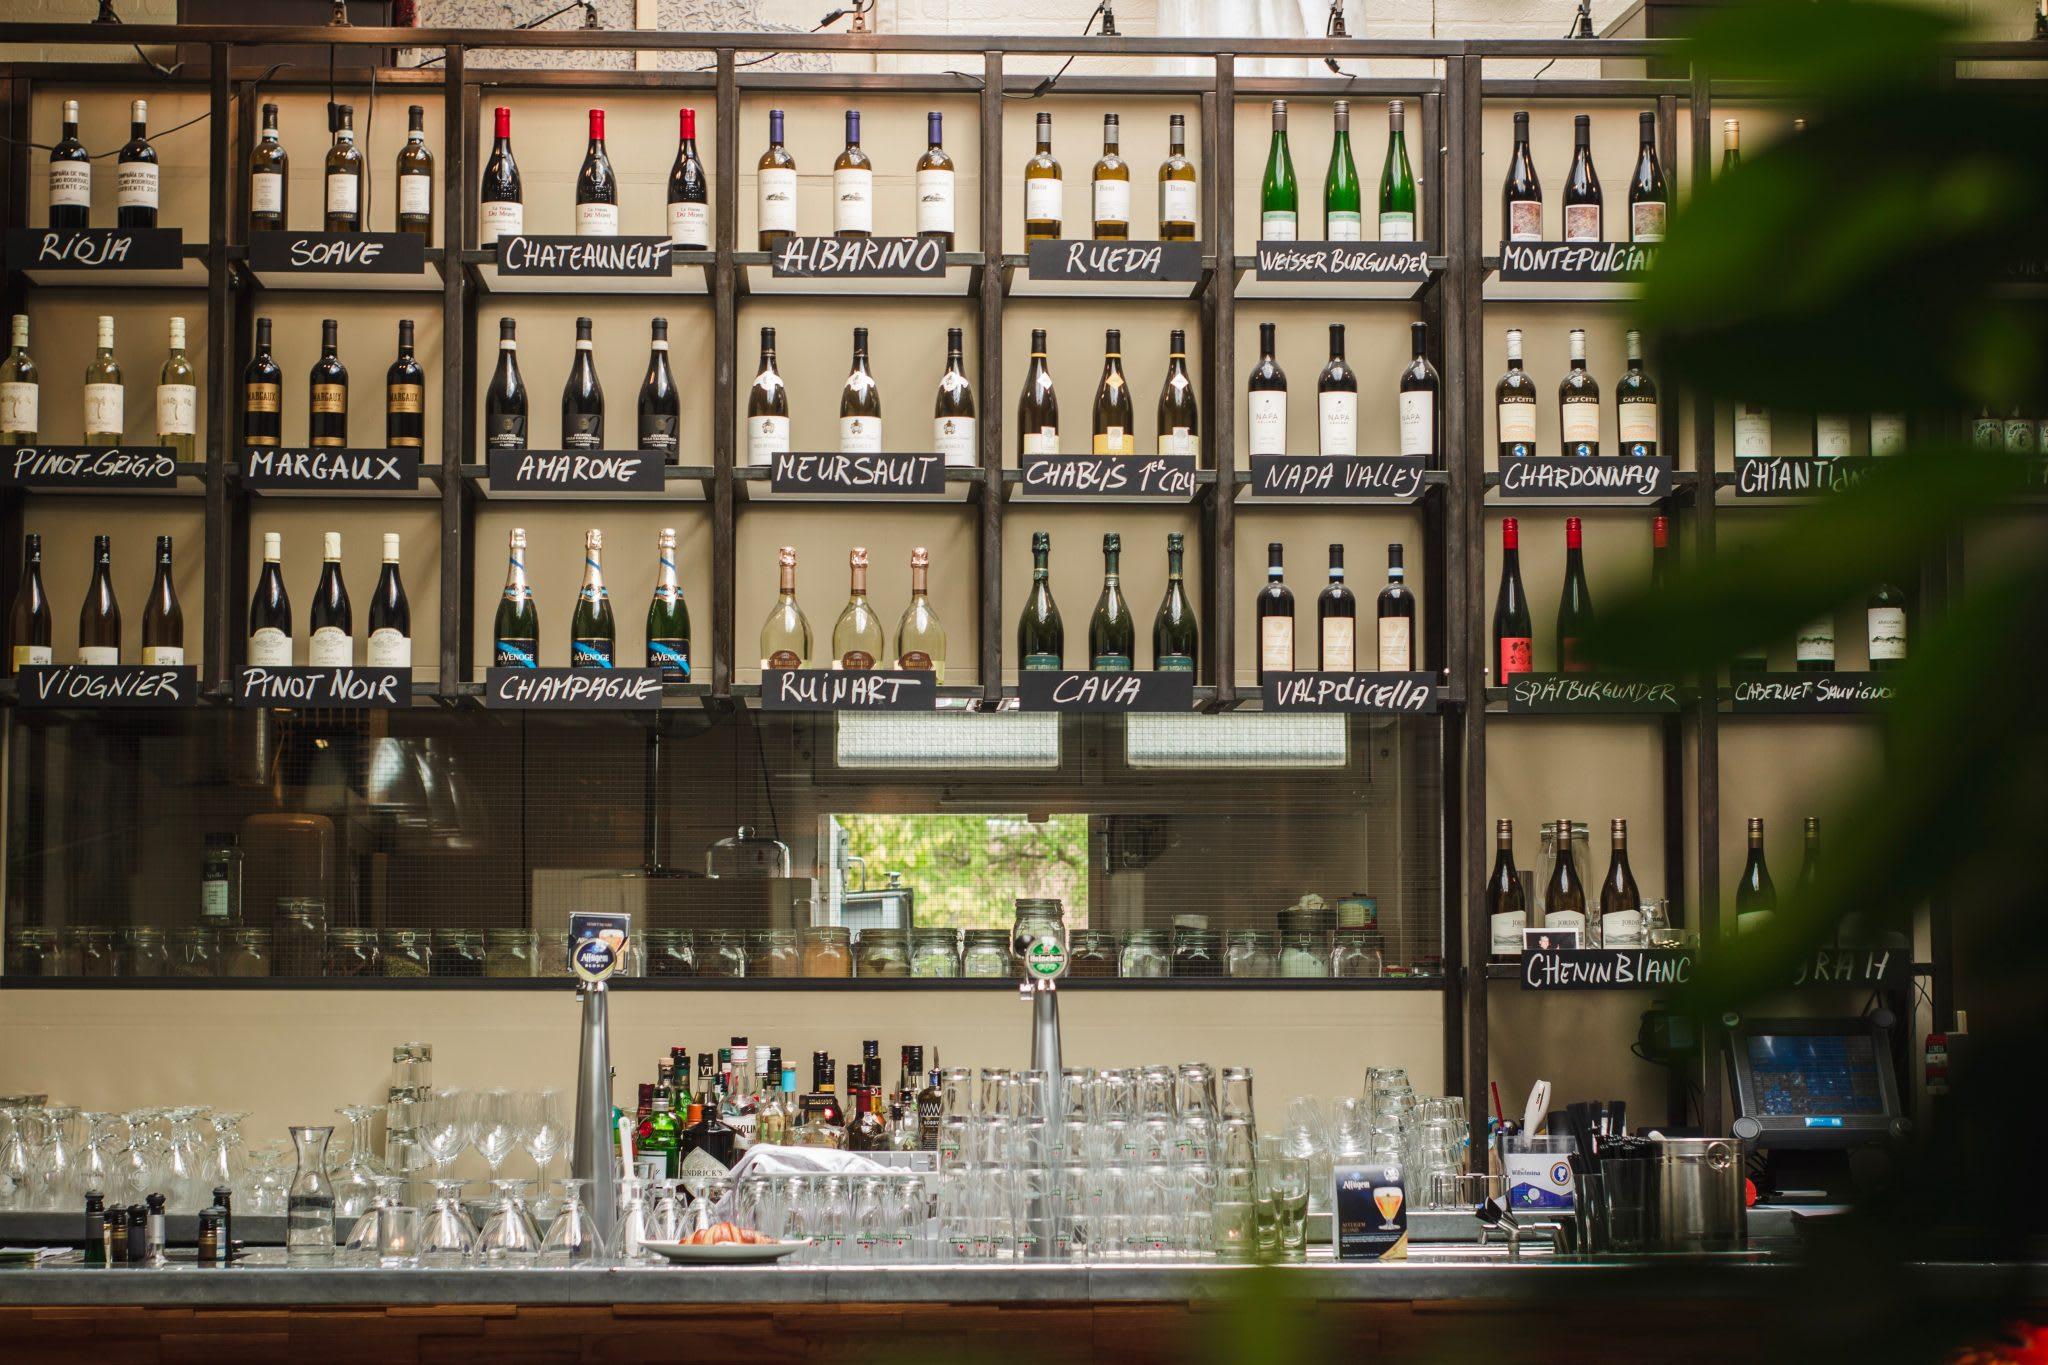 liquor, bar, liquor bottles, seasonal restaurants, sales